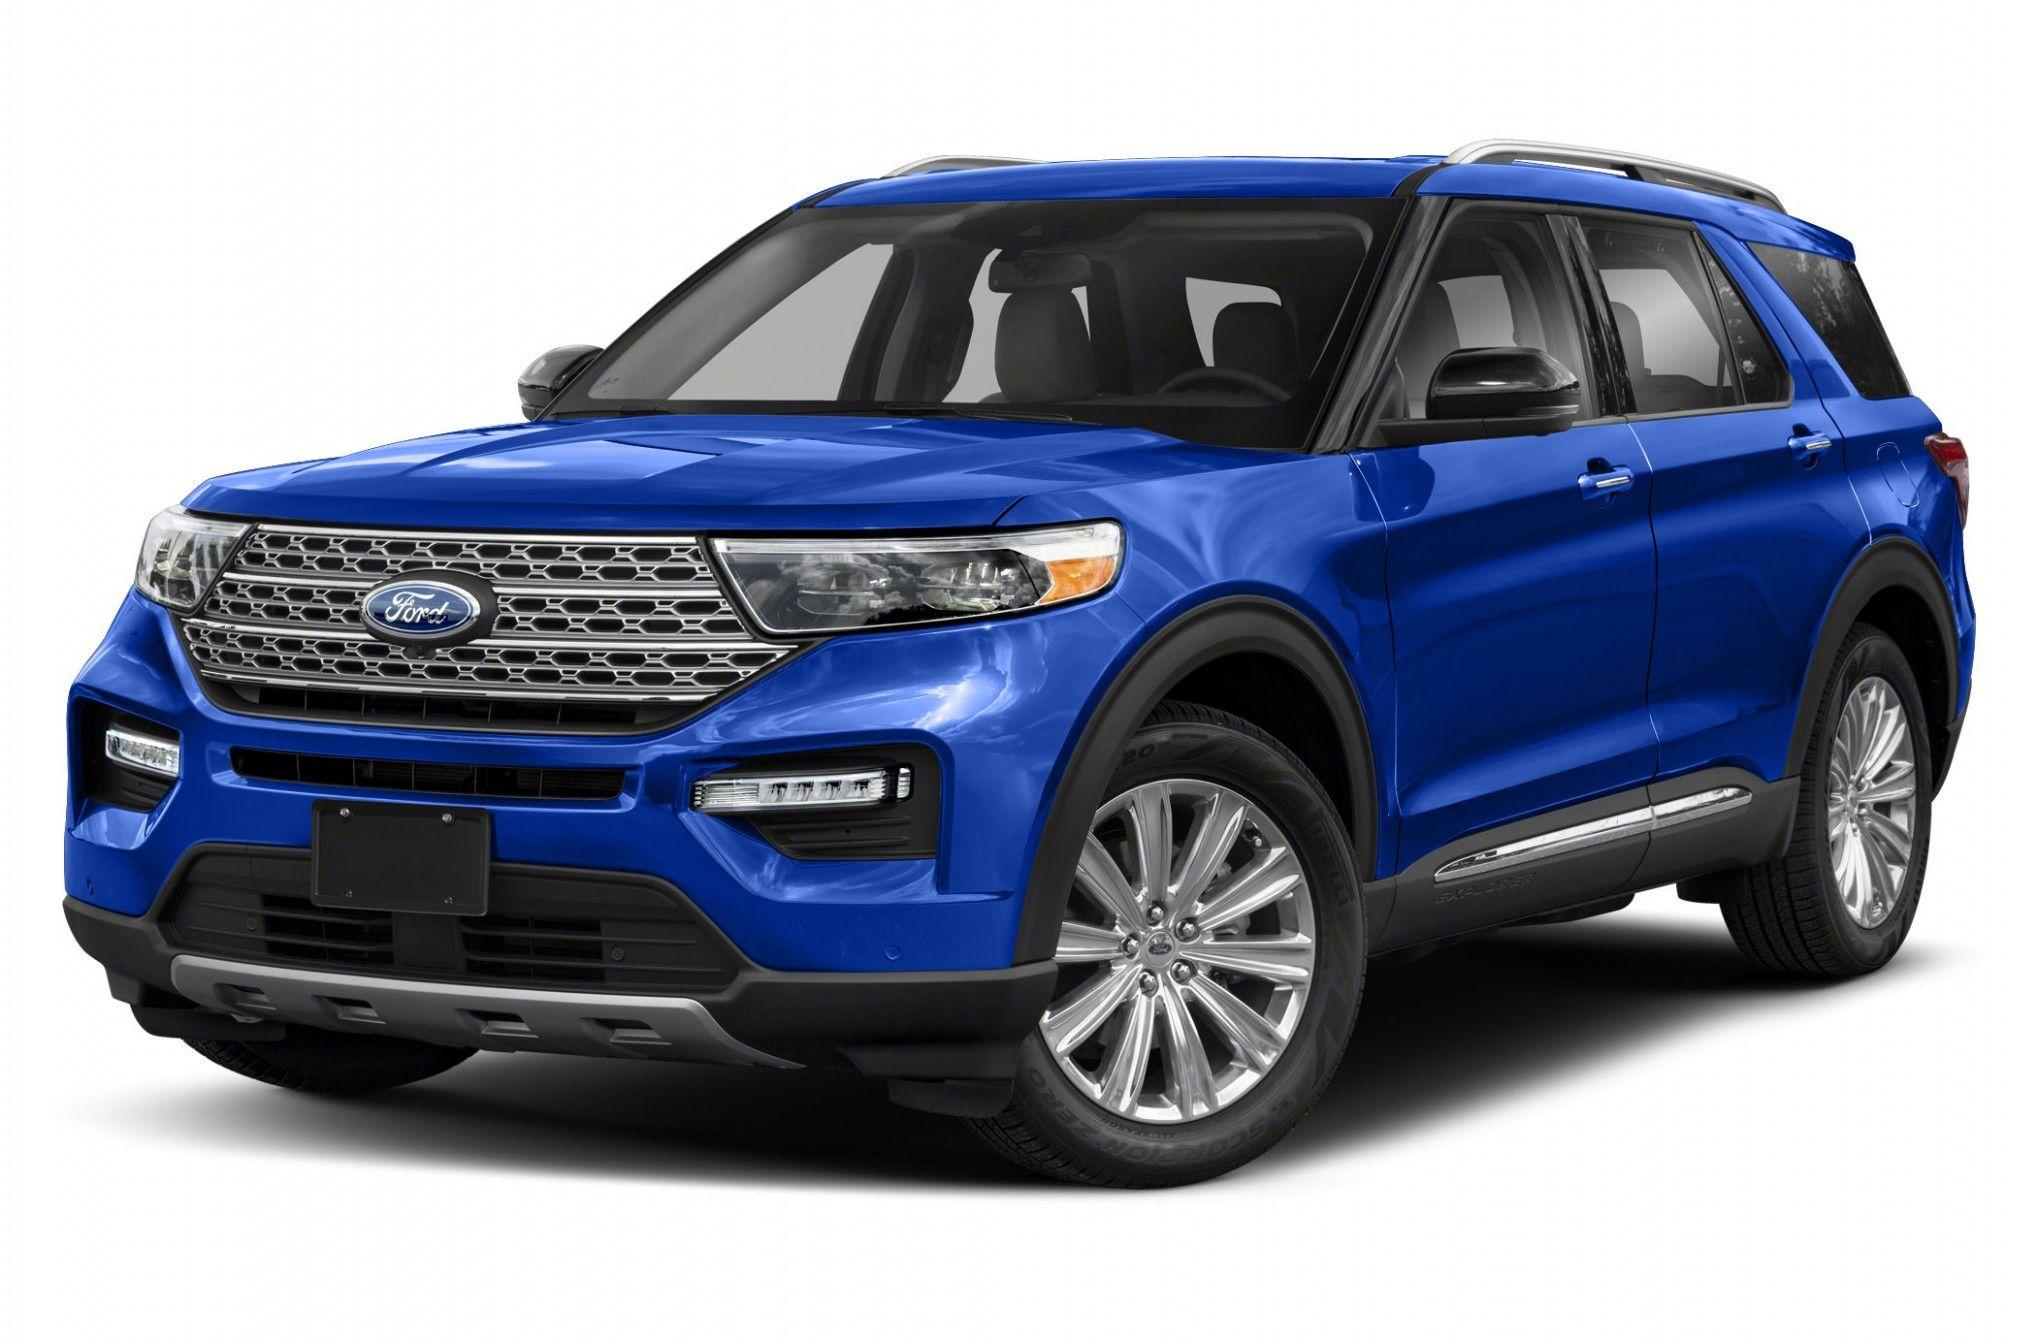 7 Picture 2020 Ford Deals In 2020 2020 Ford Explorer Ford Explorer Ford Explorer Xlt